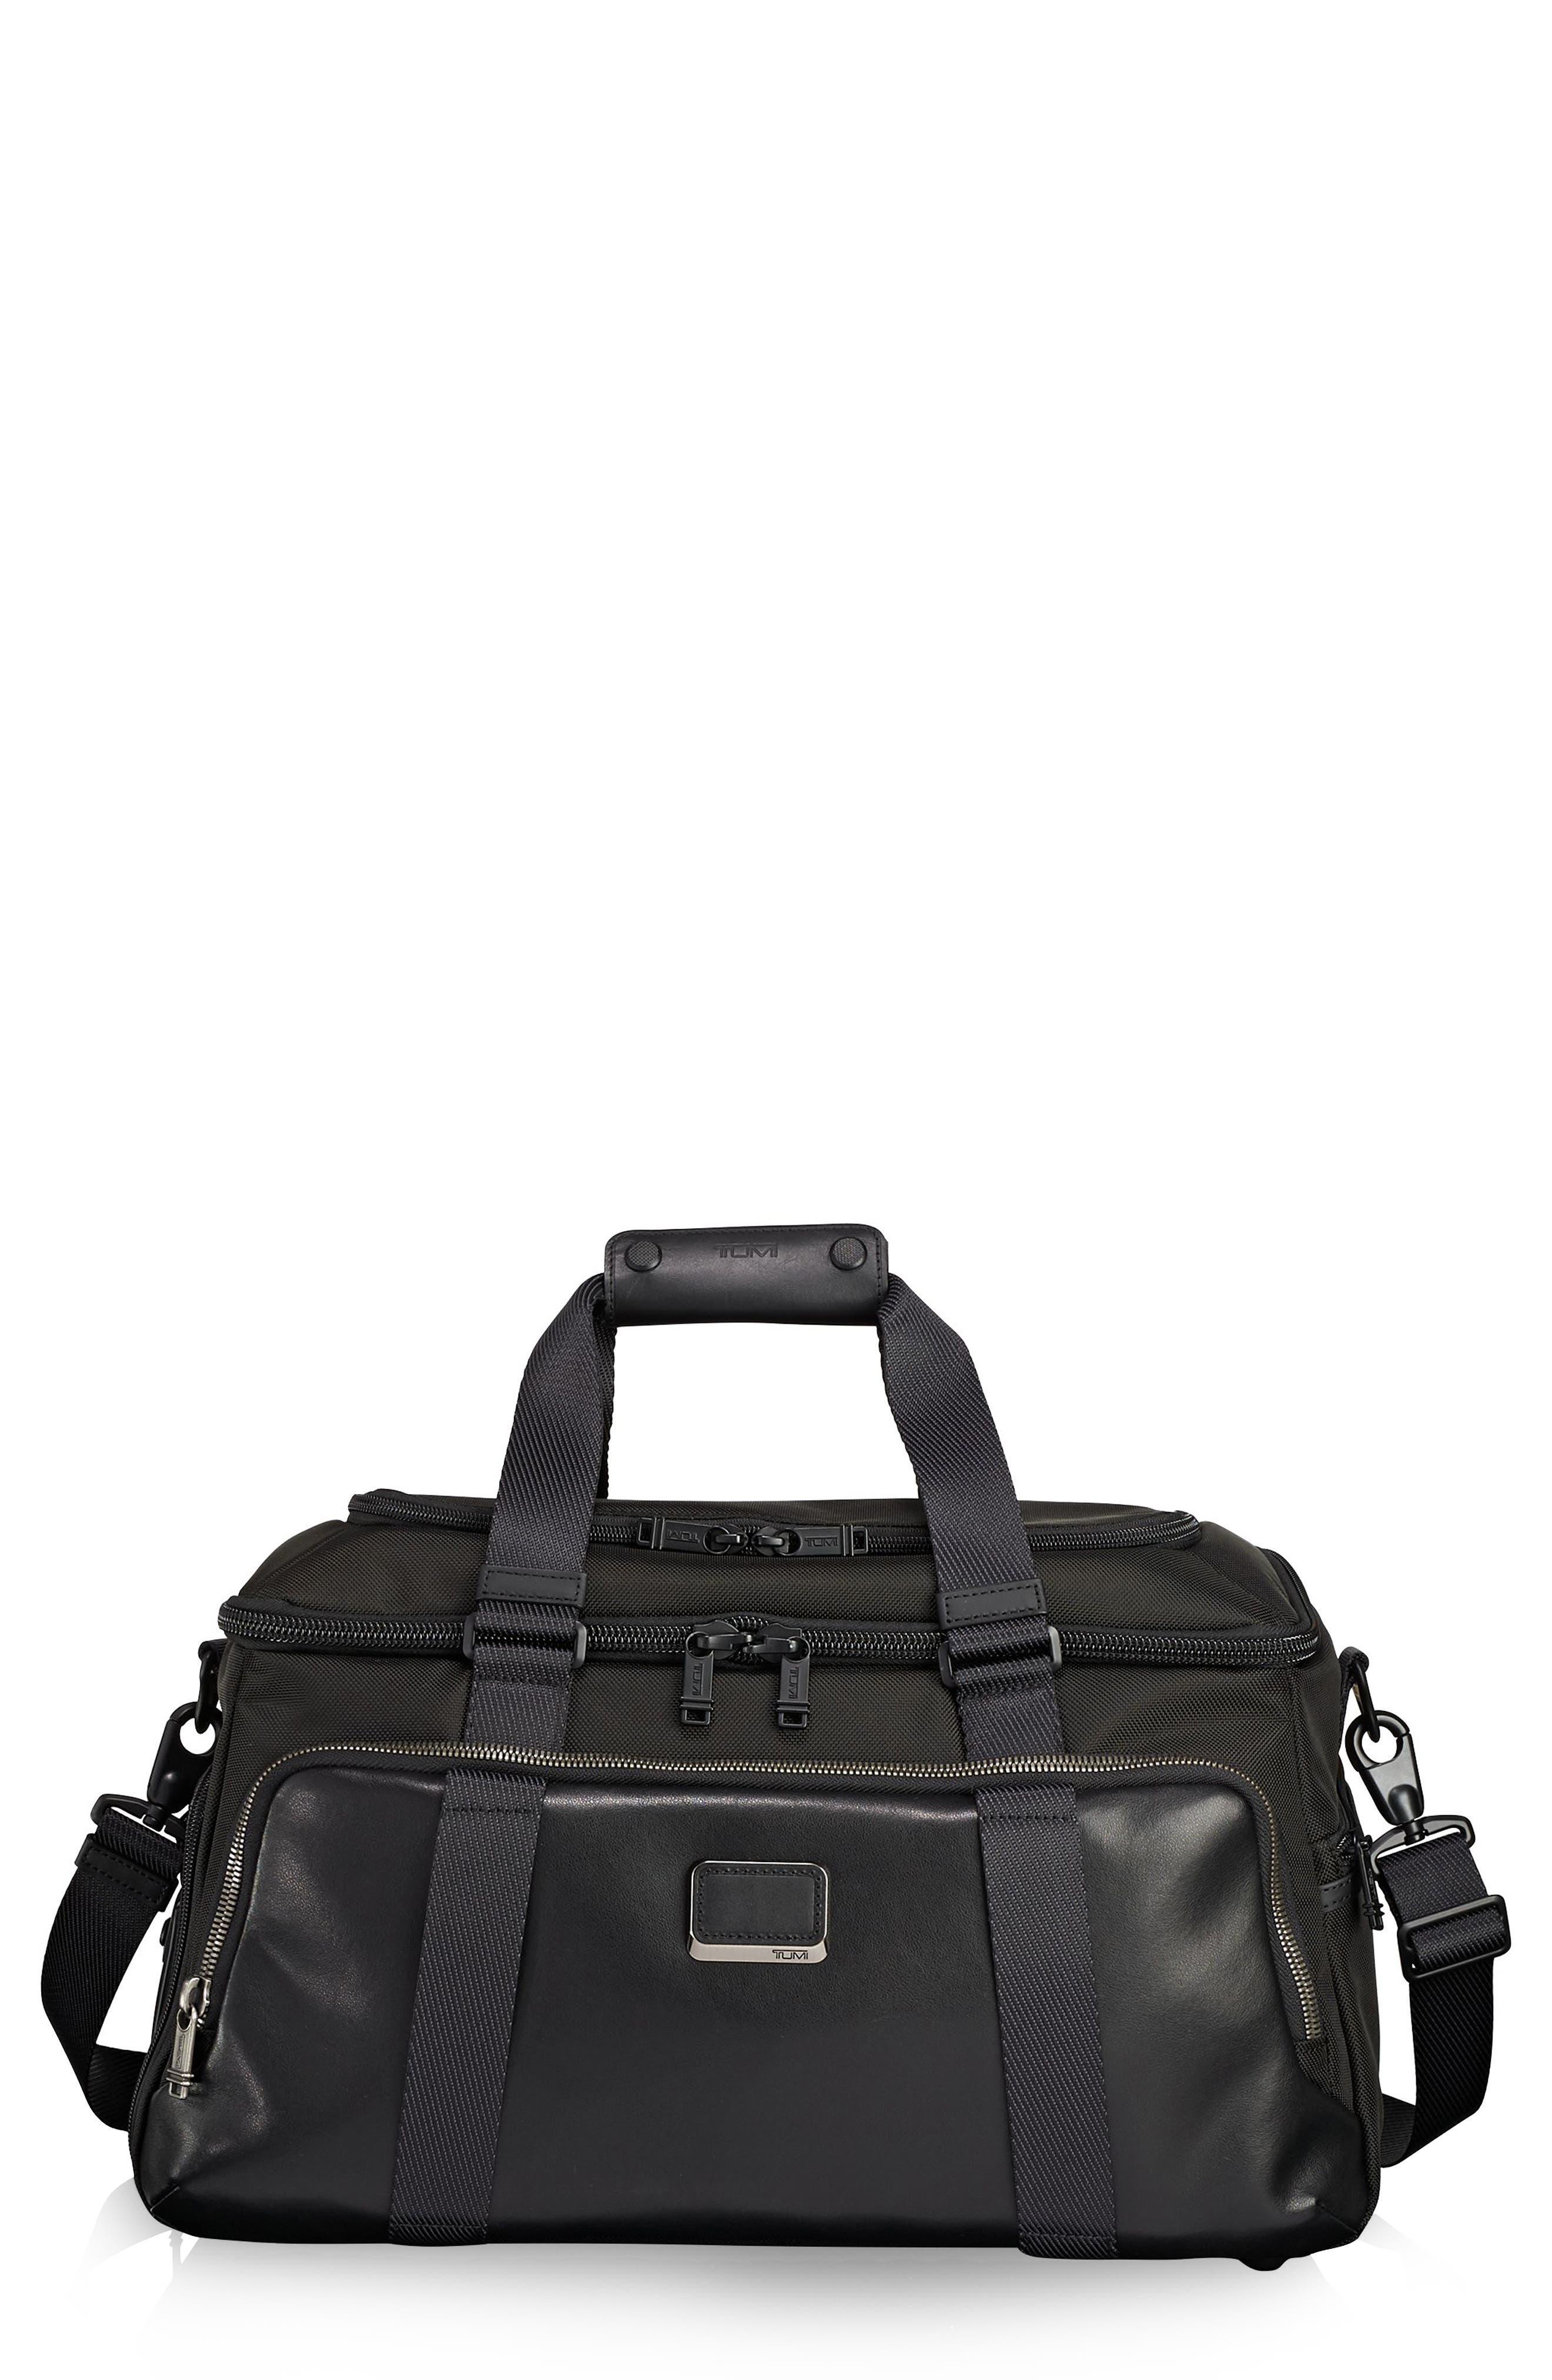 Alpha Bravo - McCoy Duffel Bag,                         Main,                         color, 001